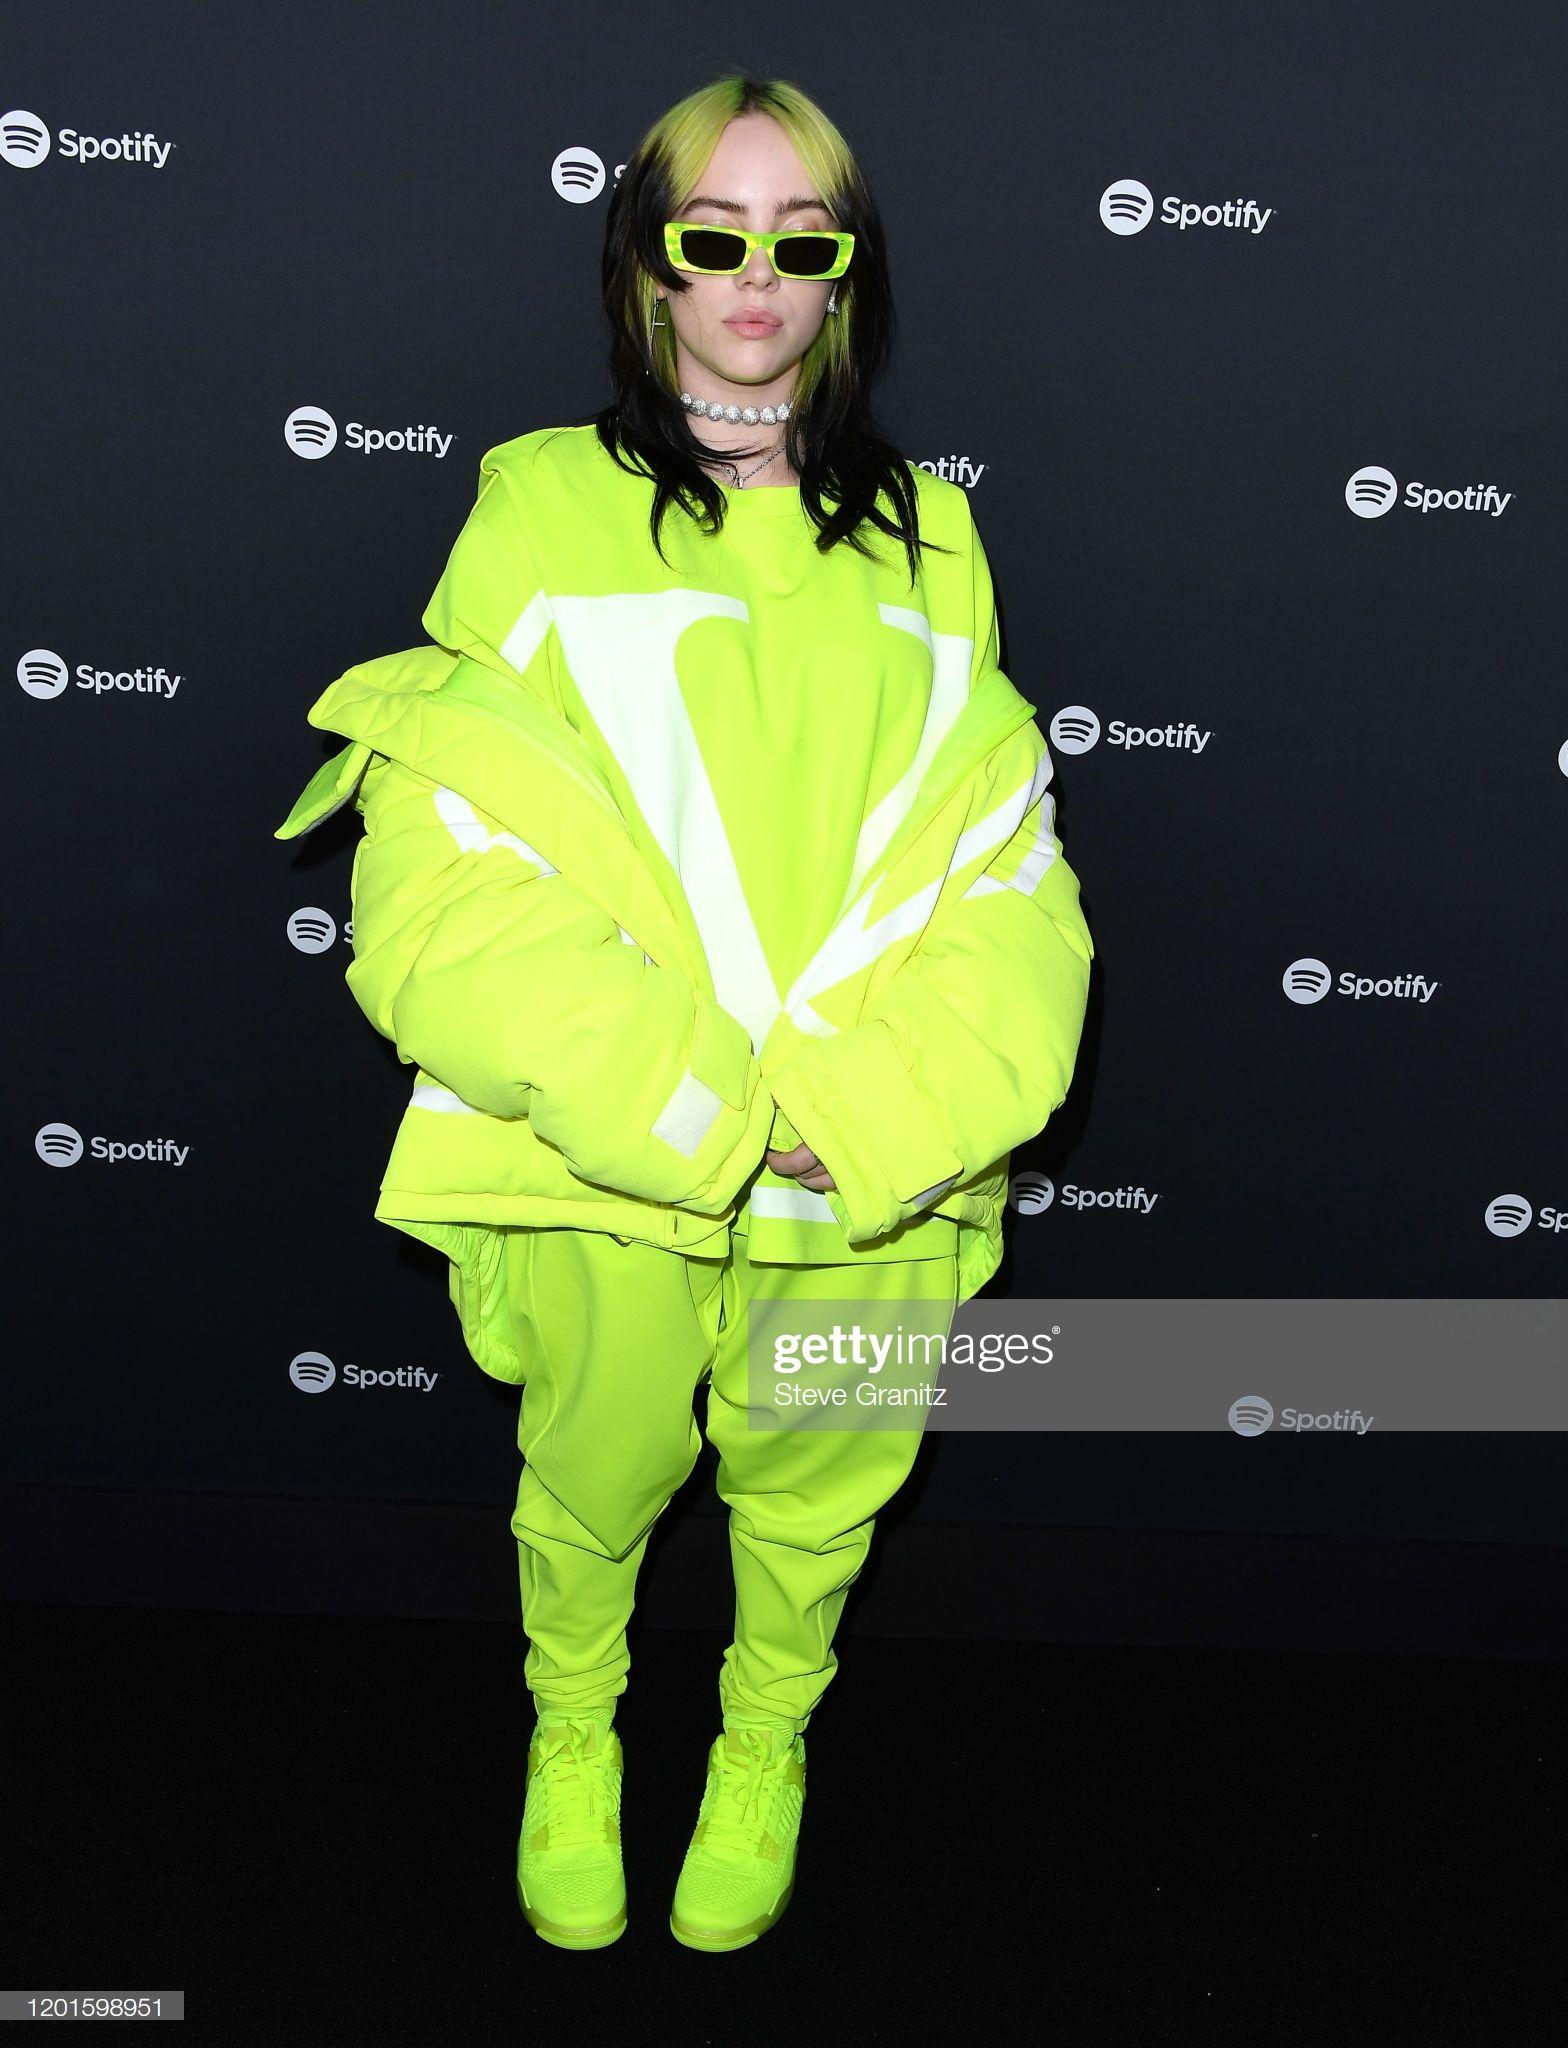 Billie Eilish arrives at the Spotify Best New Artist 2020